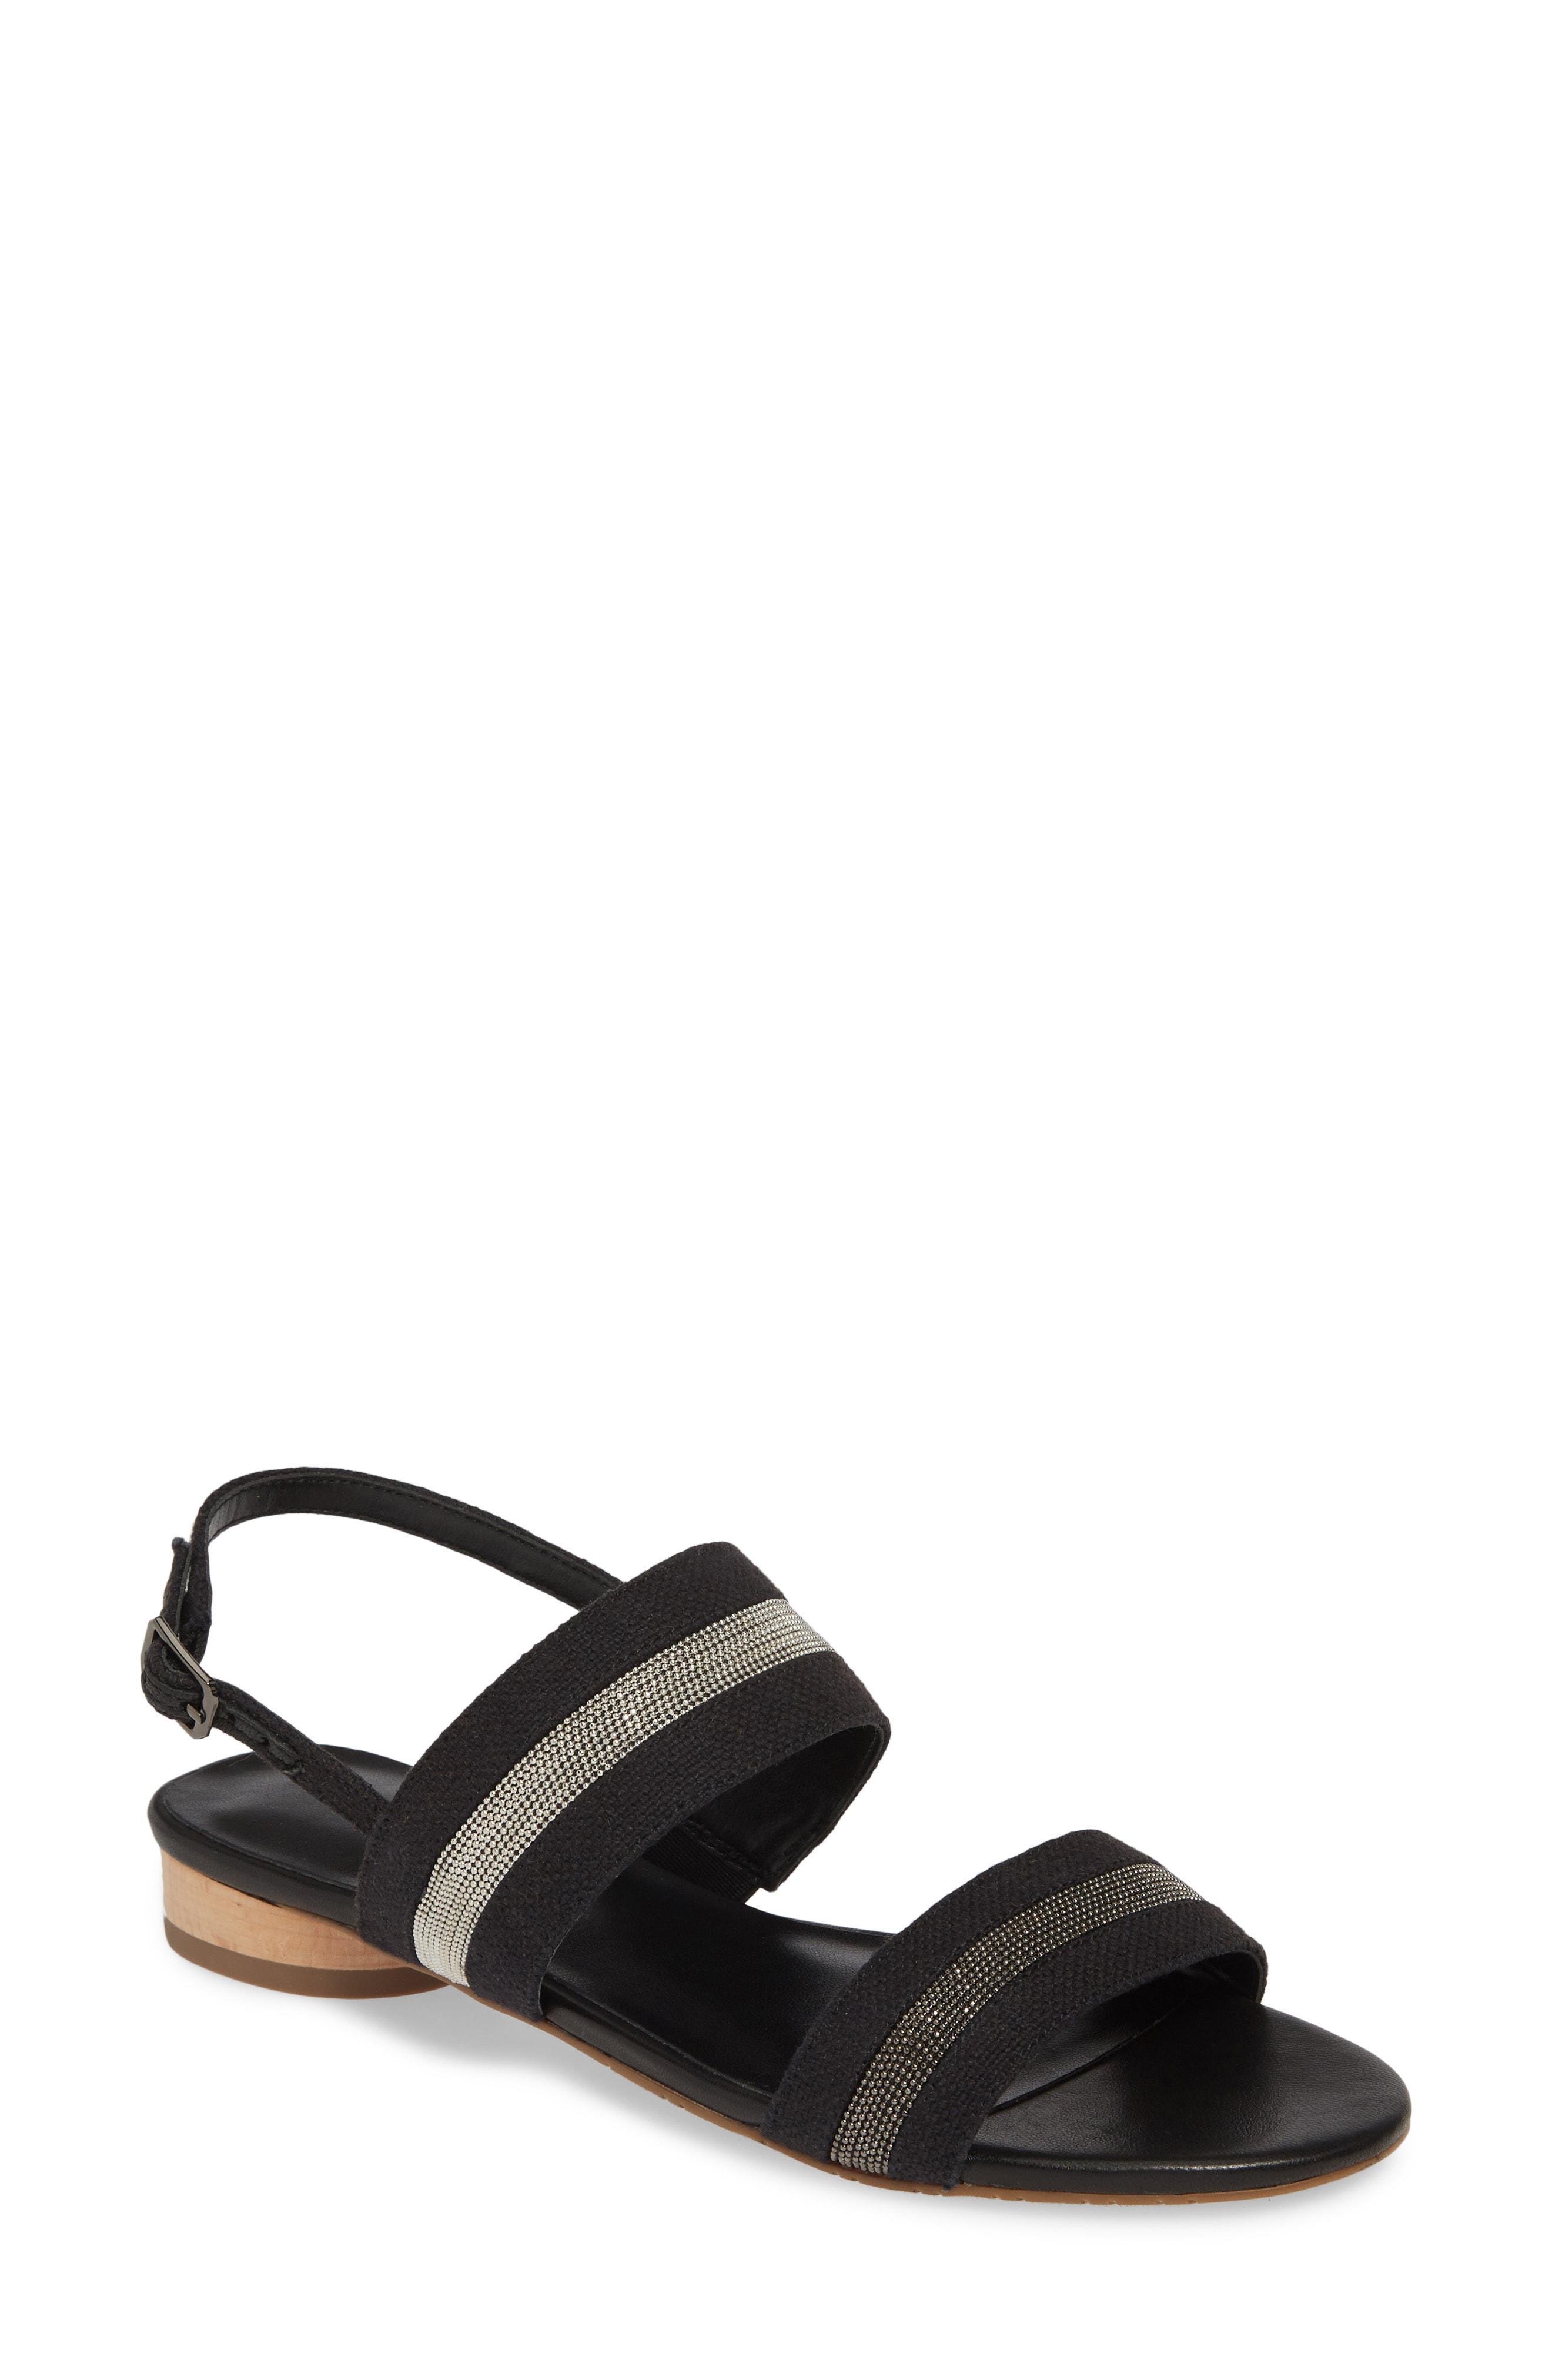 d55c421b8 Lyst - Vaneli Brylee Embellished Slingback Sandal in Black